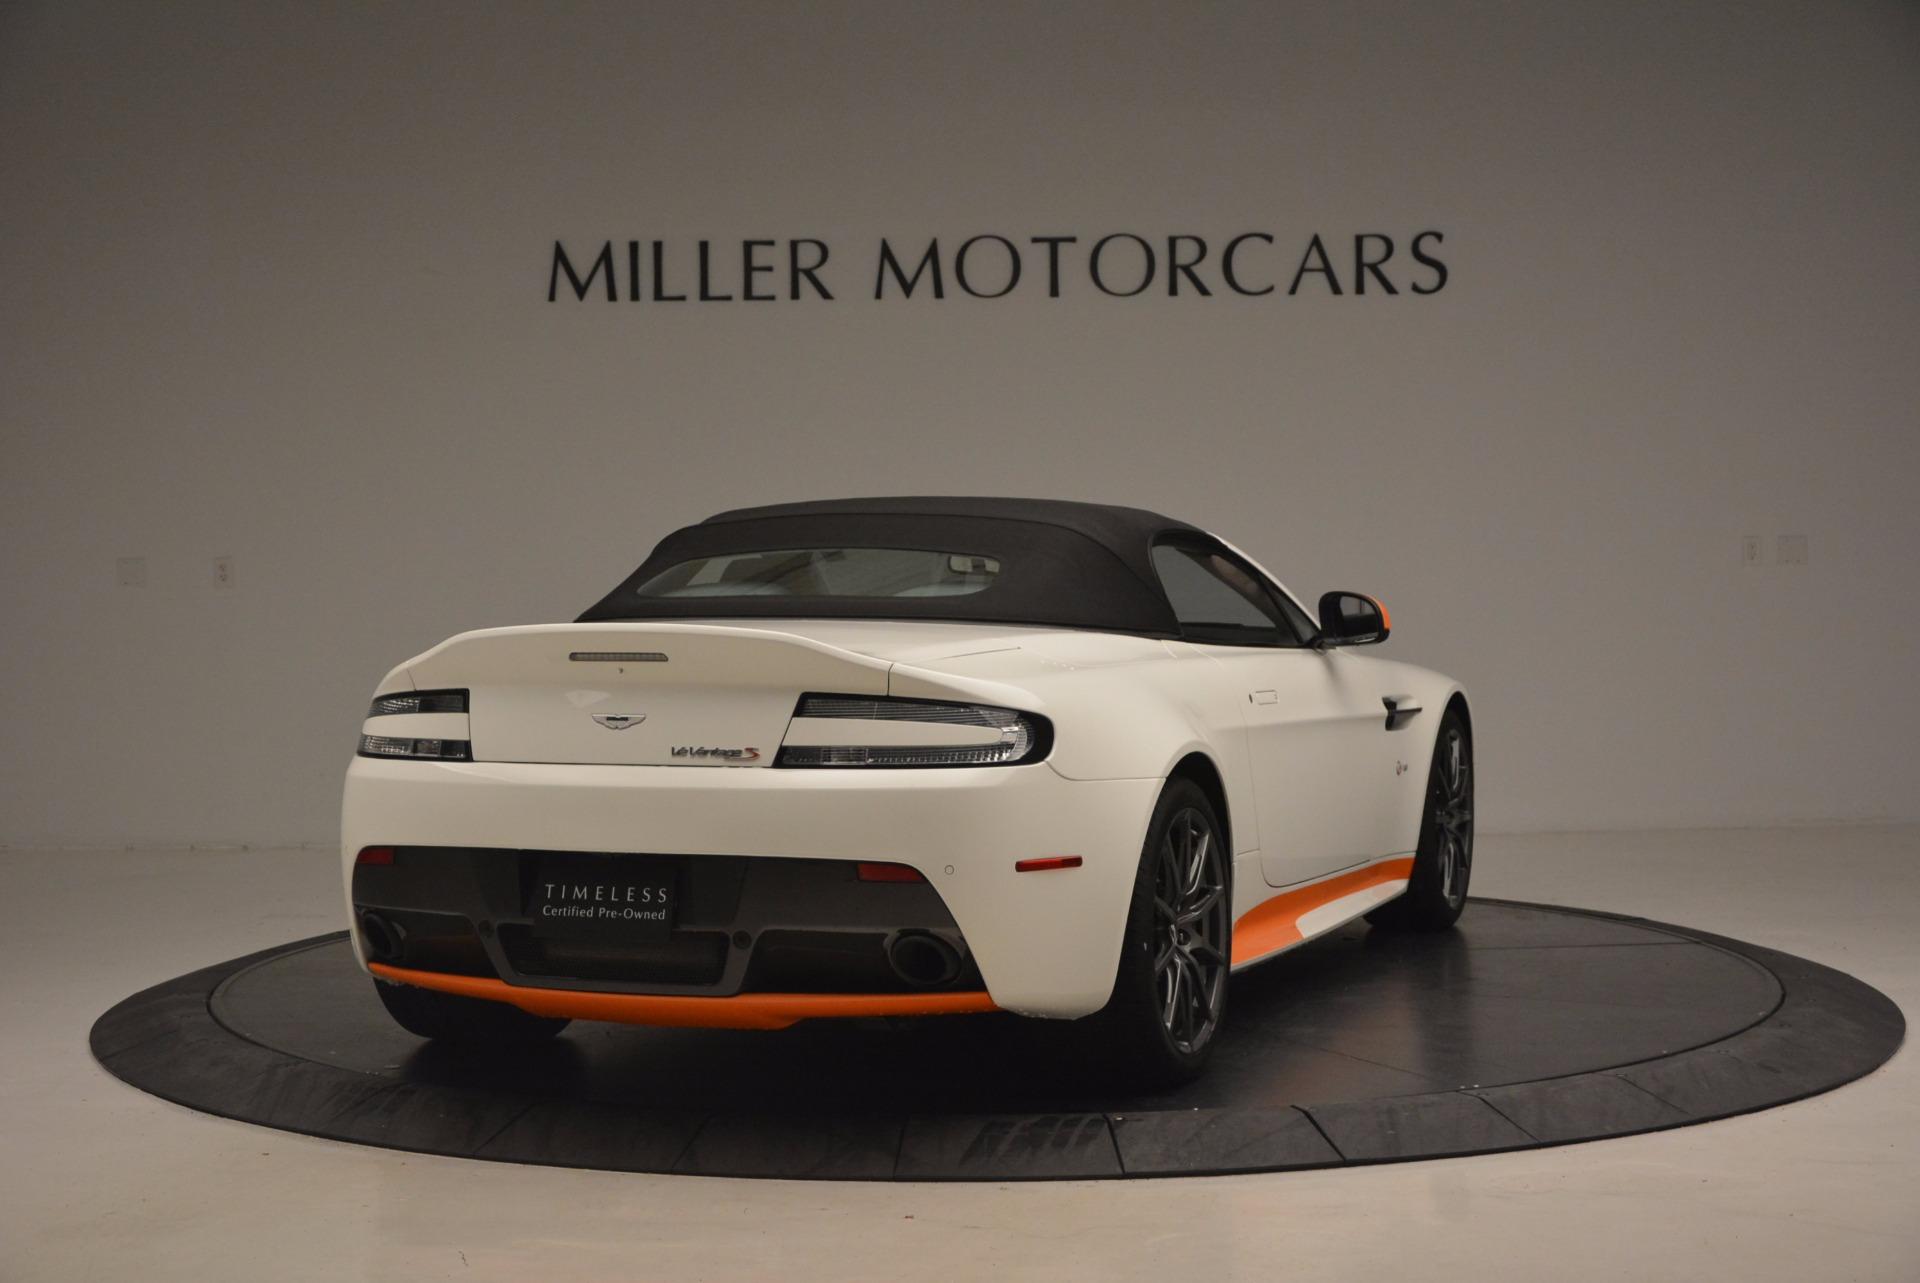 Used 2017 Aston Martin V12 Vantage S Convertible For Sale In Greenwich, CT. Alfa Romeo of Greenwich, 7514 1134_p19